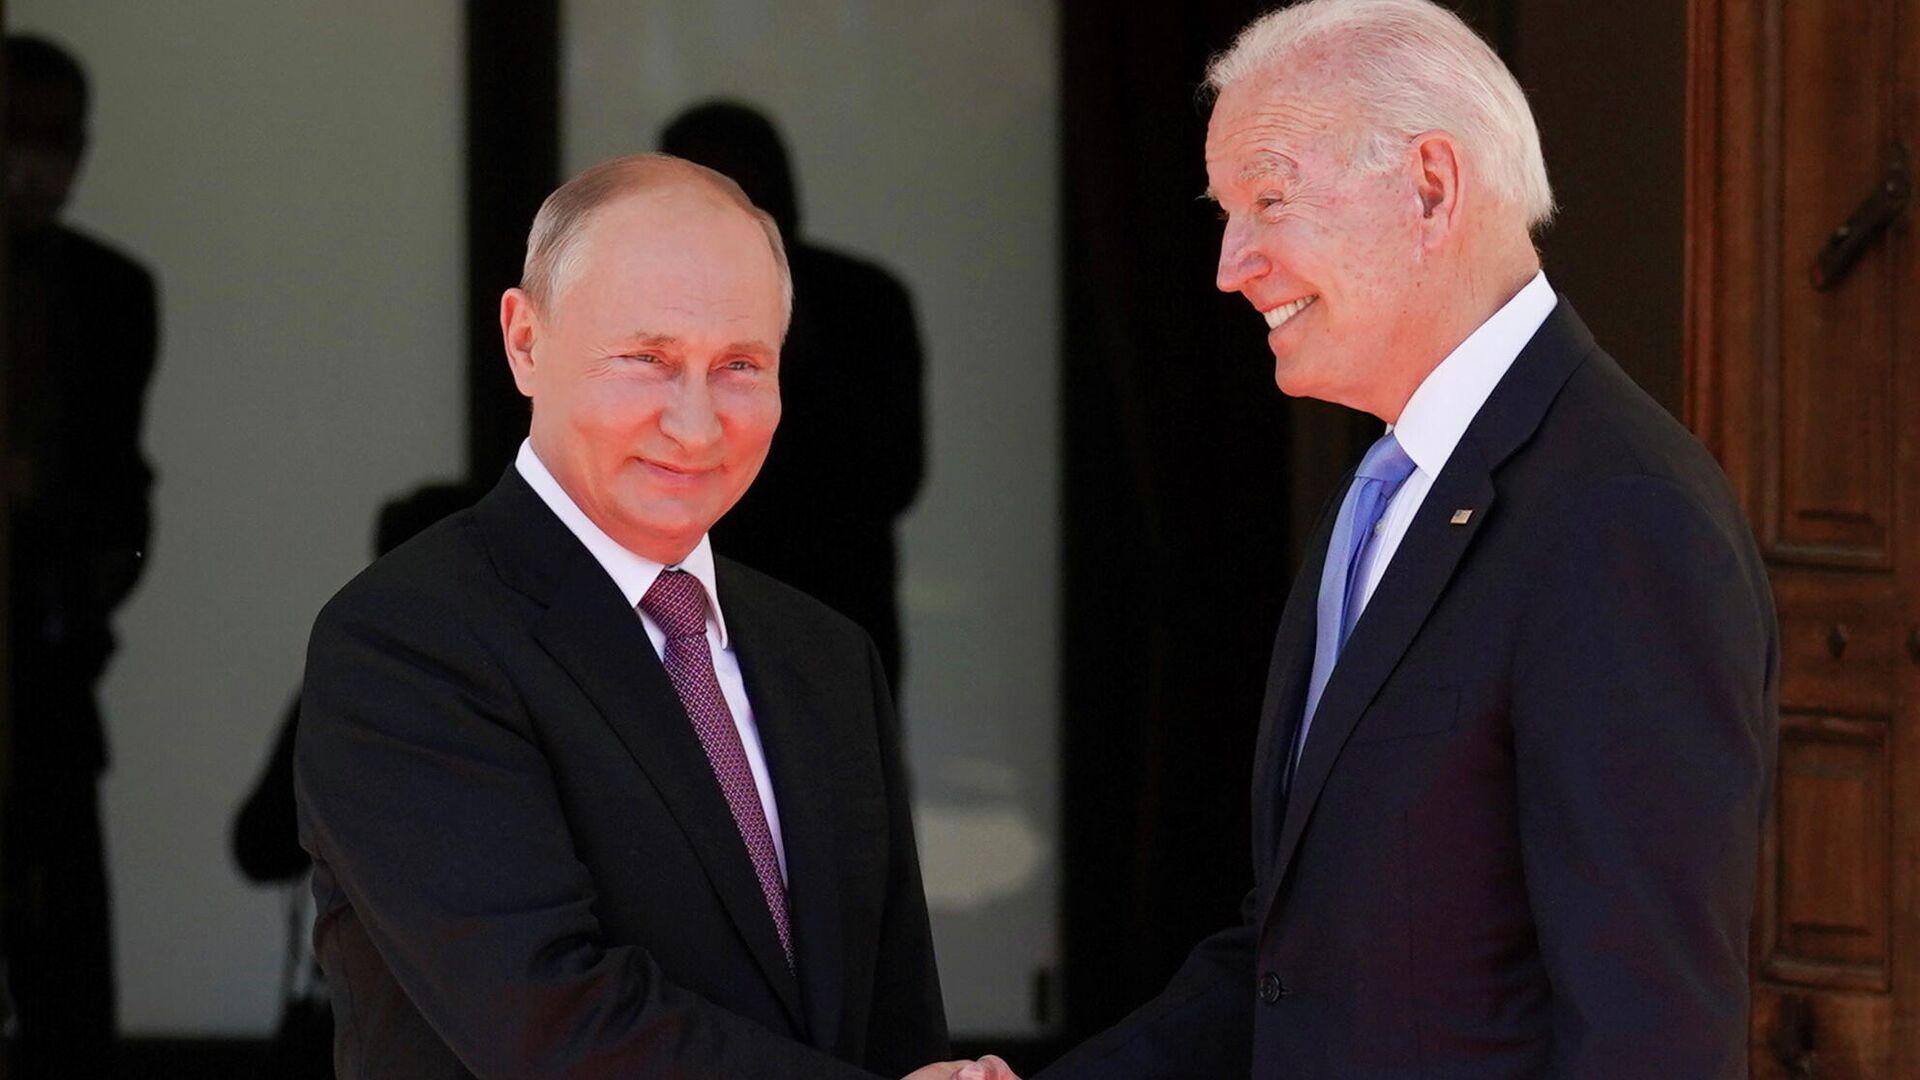 Президент РФ Владимир Путин и президент США Джо Байден во время встречи на вилле Ла Гранж в Женеве - РИА Новости, 1920, 16.06.2021